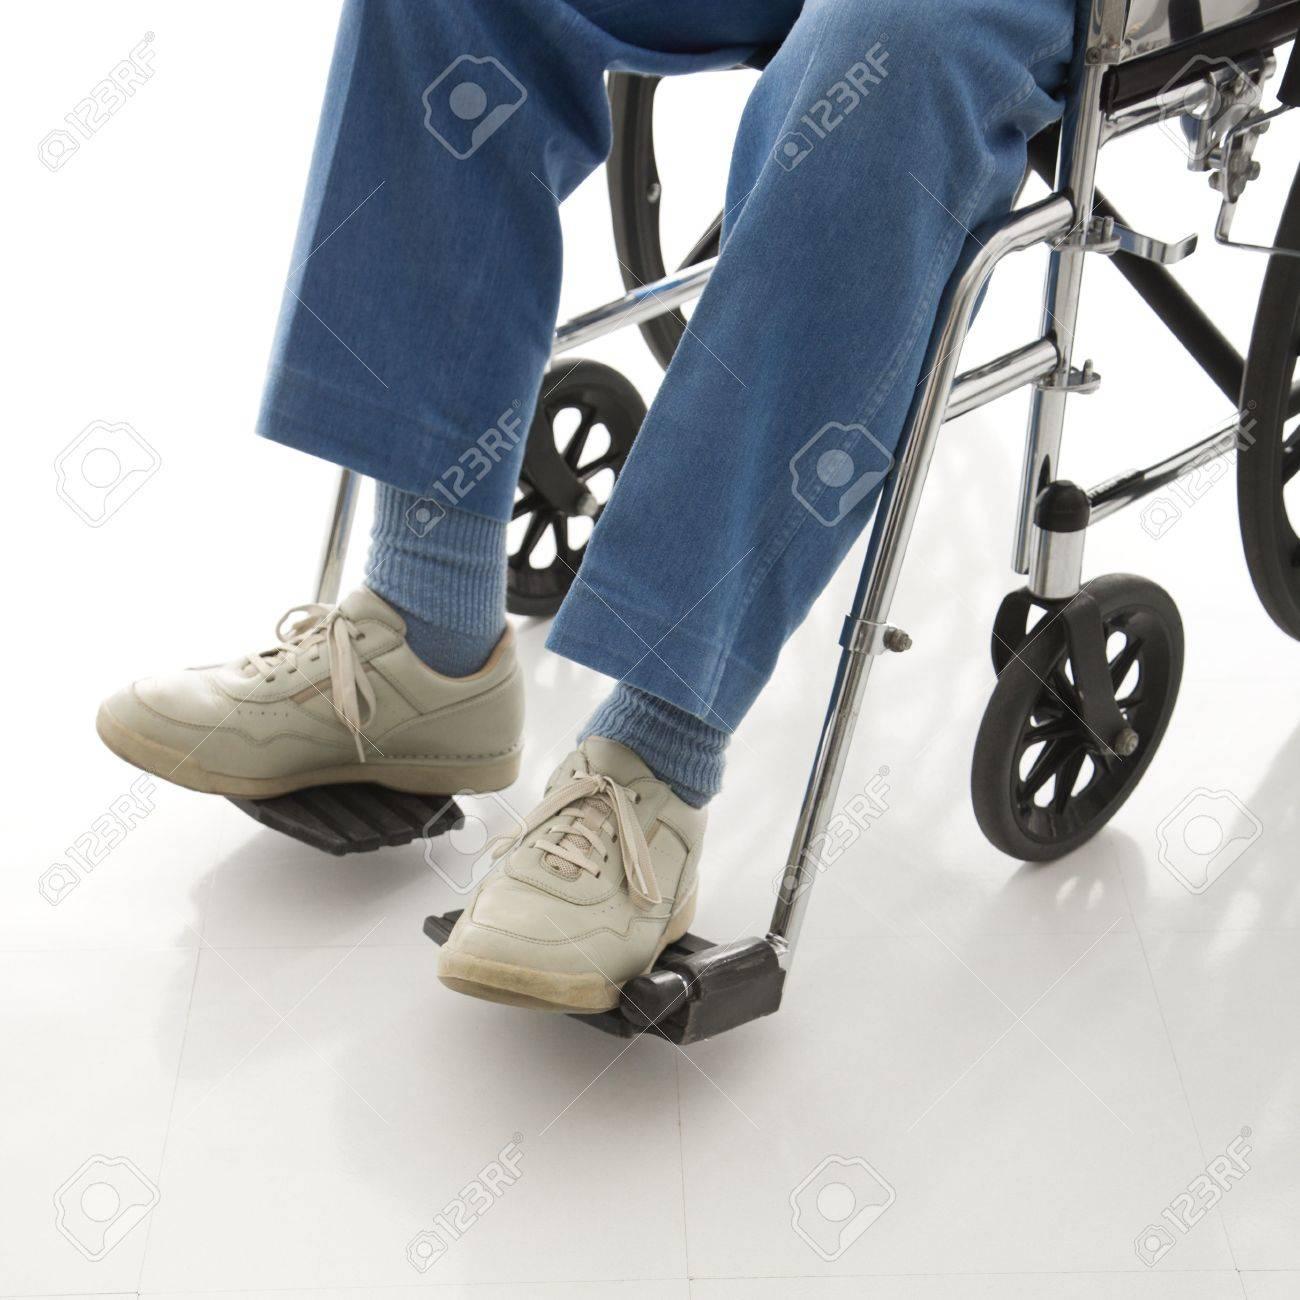 Legs and feet of elderly man sitting in wheelchair. Stock Photo - 2245957